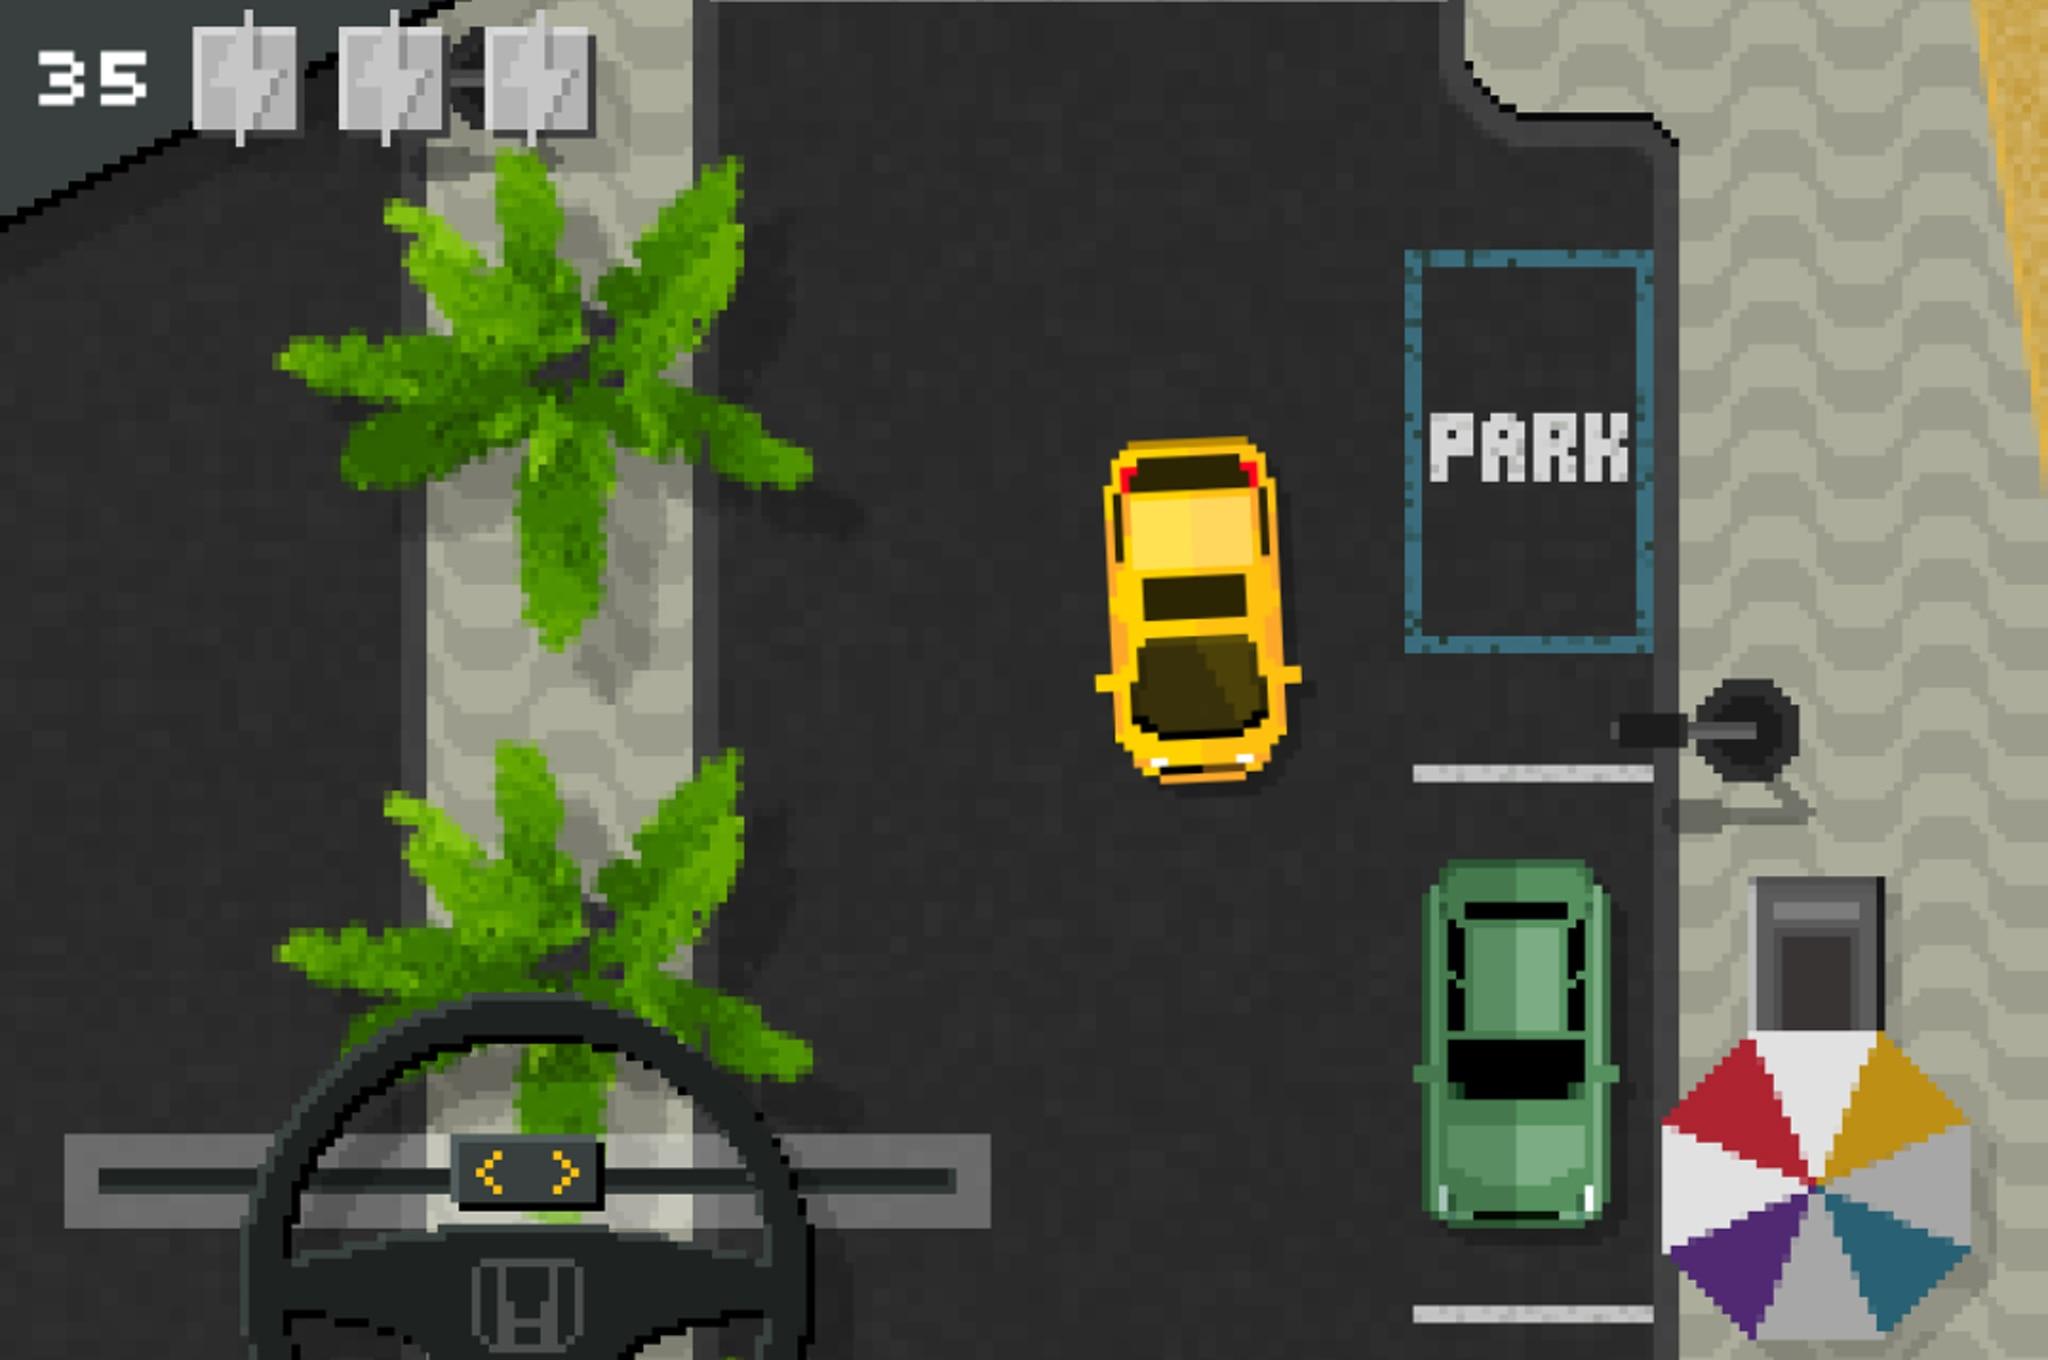 Honda Fit Challenge Game Screenshot 031